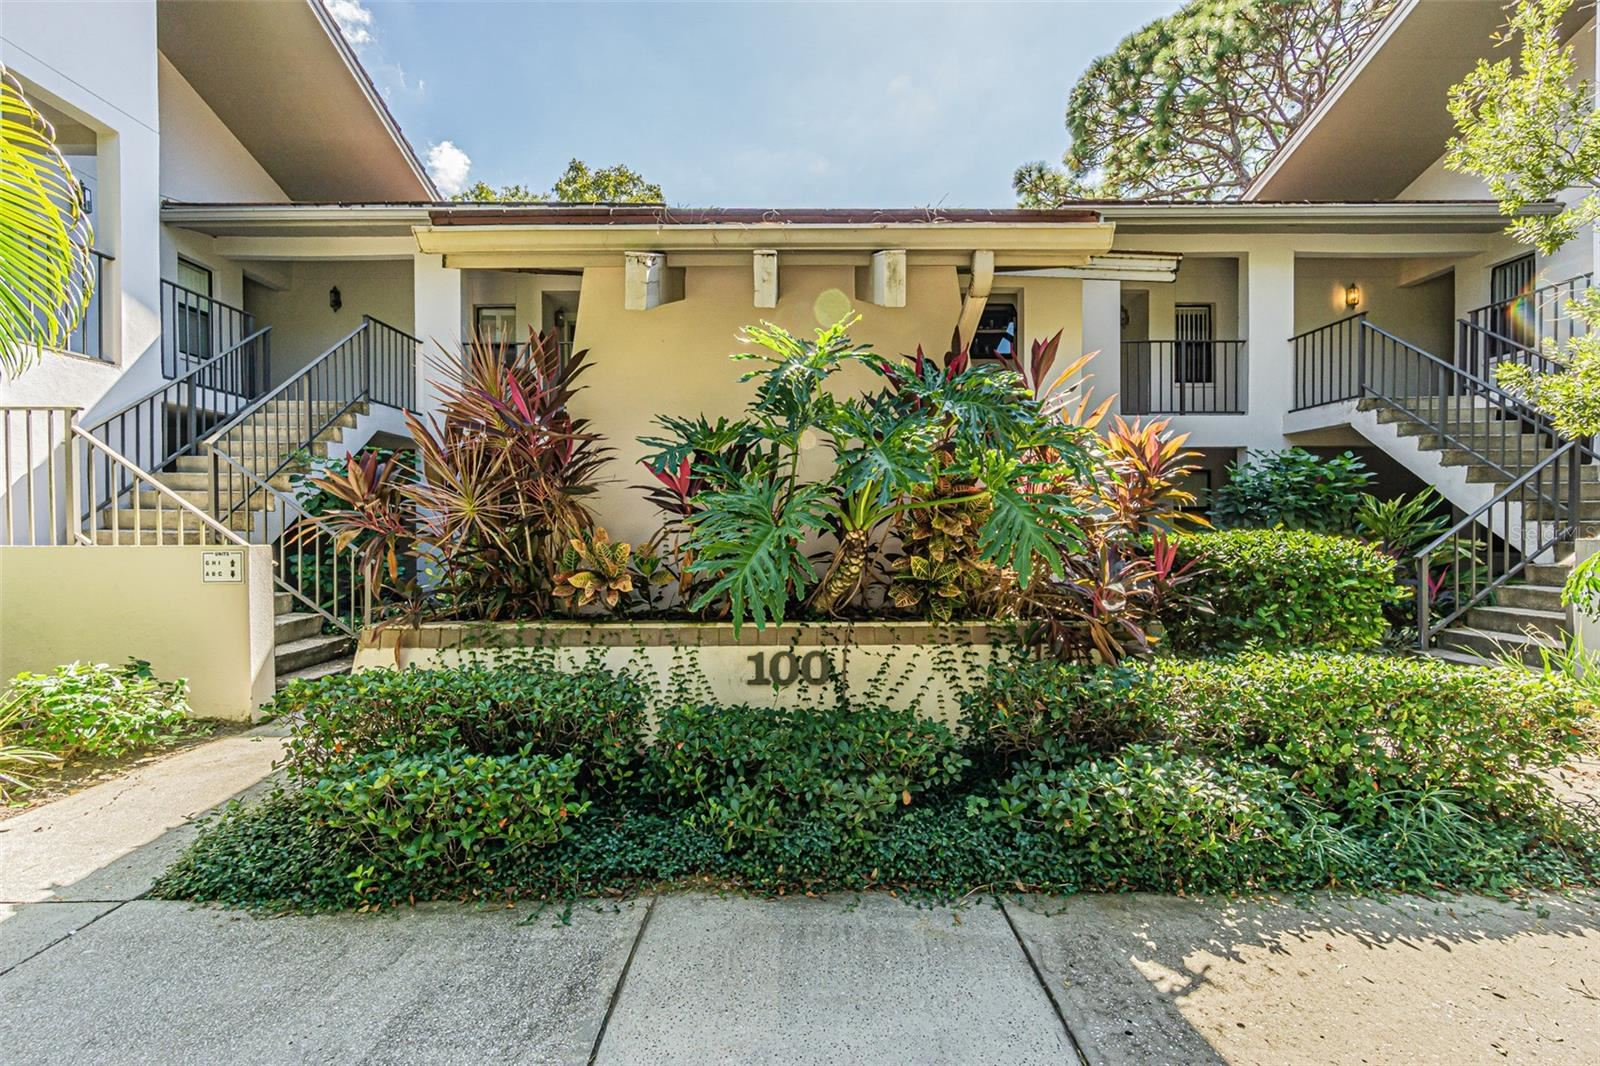 300 S FLORIDA AVENUE #100K, Tarpon Springs, FL 34689 - MLS#: U8141050